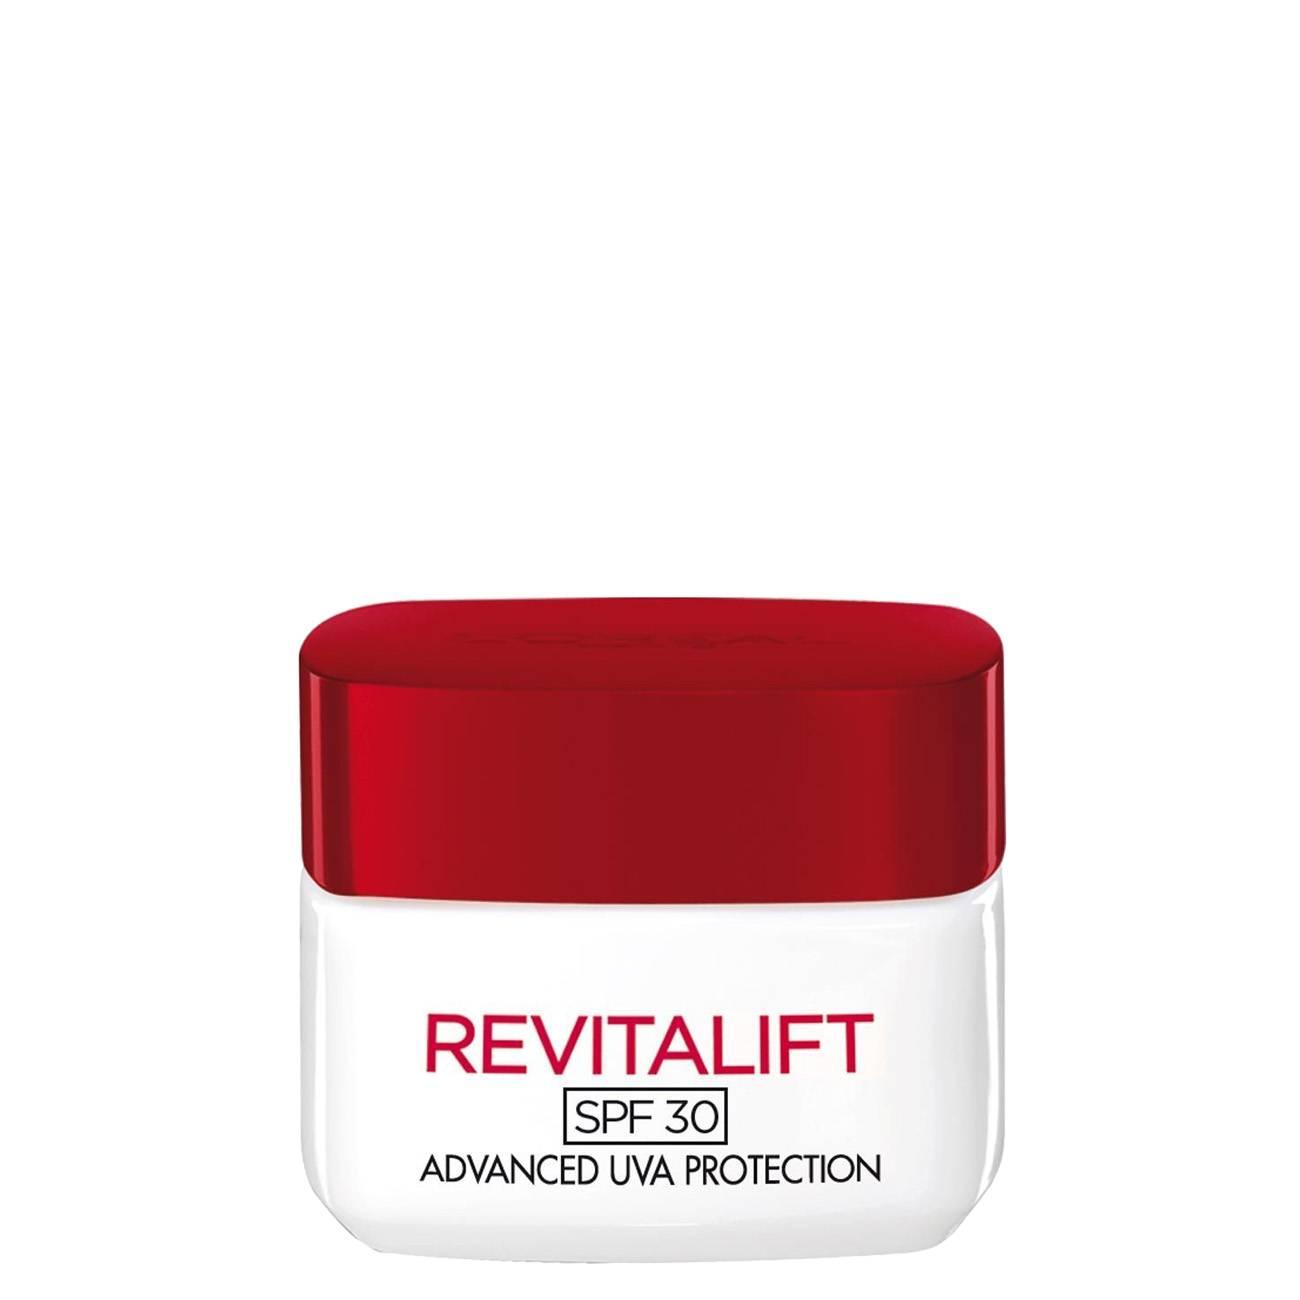 Revitalift 50 Ml L'Oreal imagine 2021 bestvalue.eu